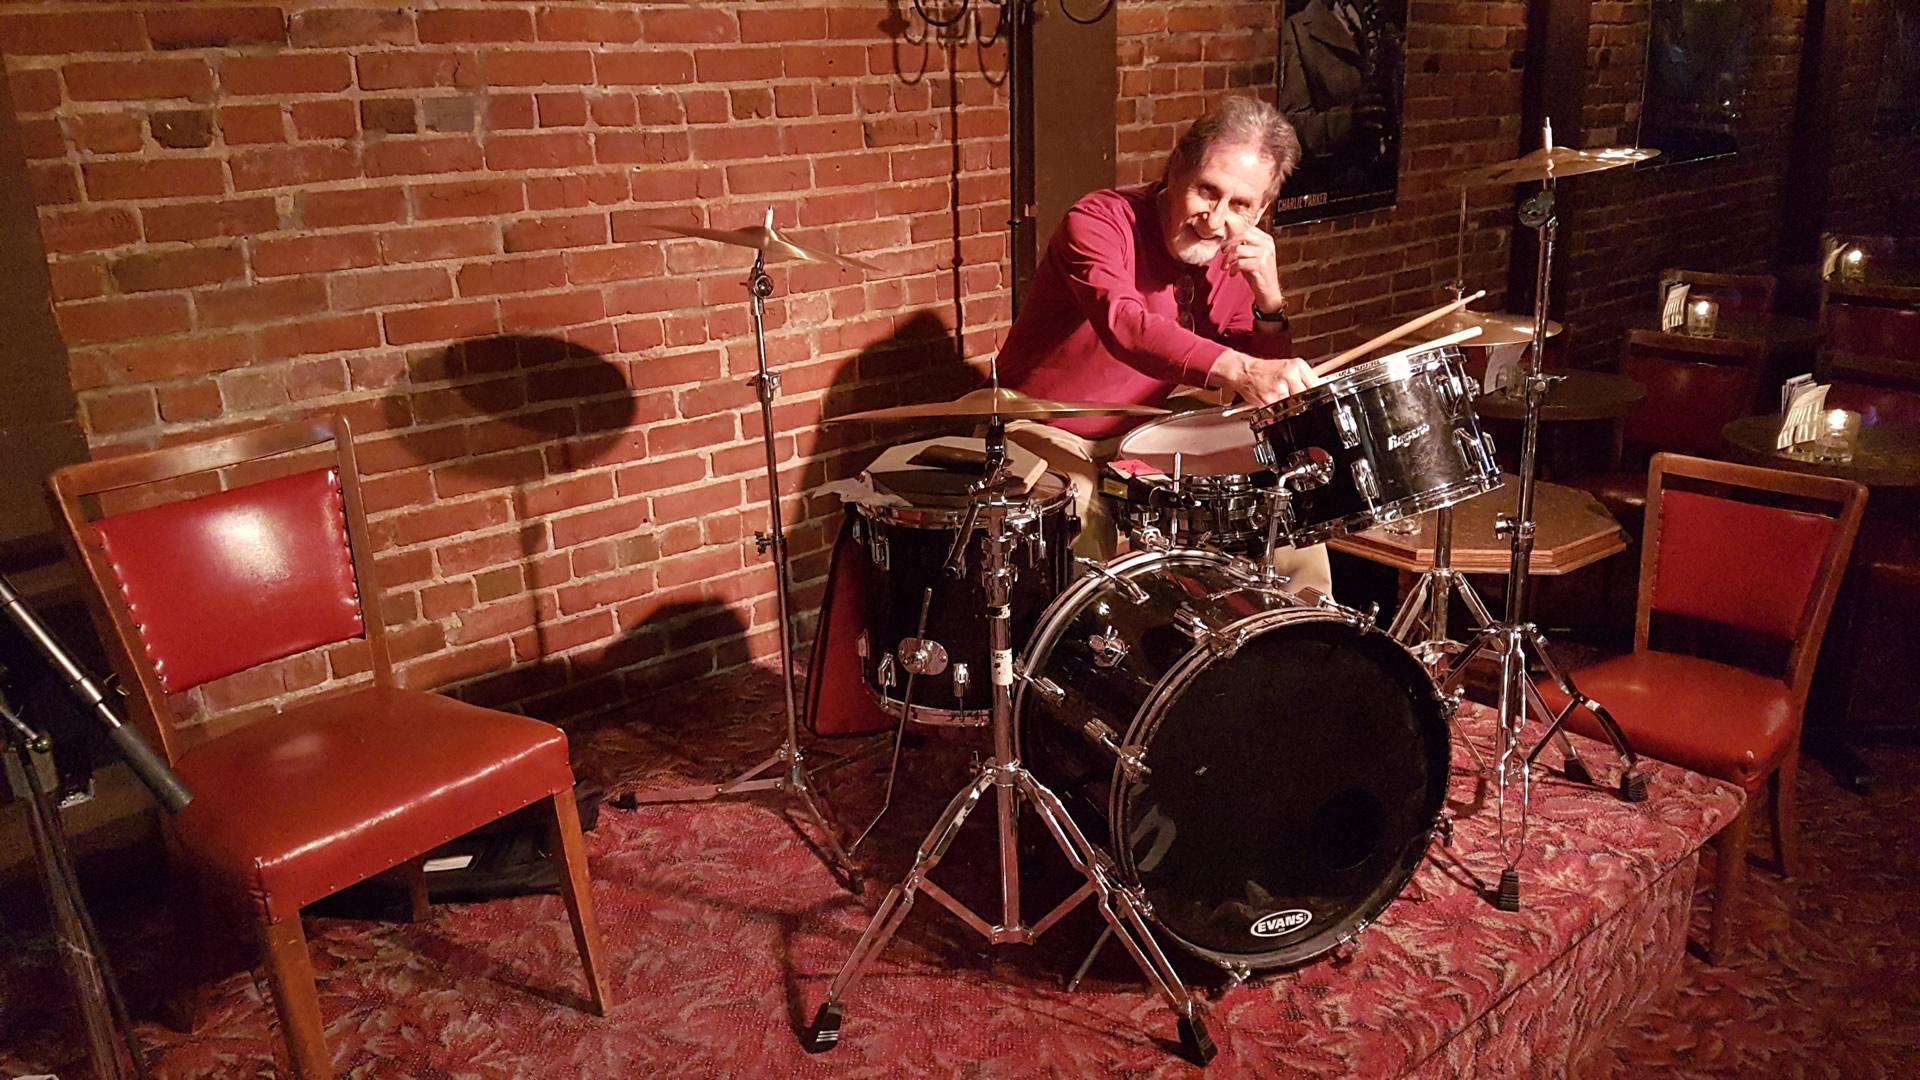 Barry-Casson-Hermanns-Jazz-Club-photo-by-Clarke-Wright-20180521_181911